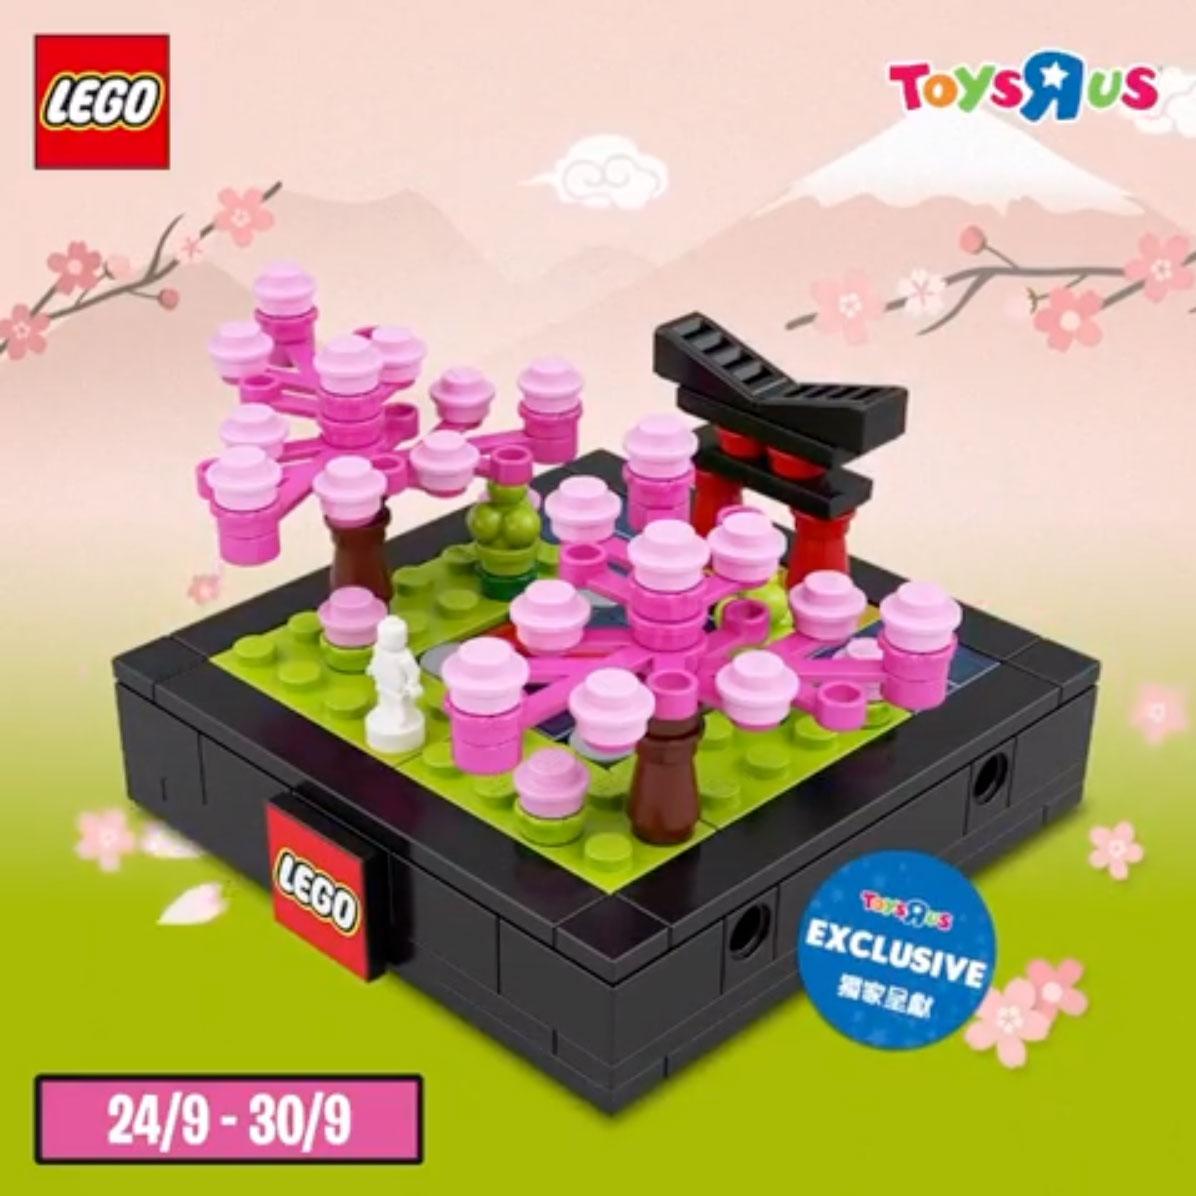 lego-bricktober-tru-1 zusammengebaut.com